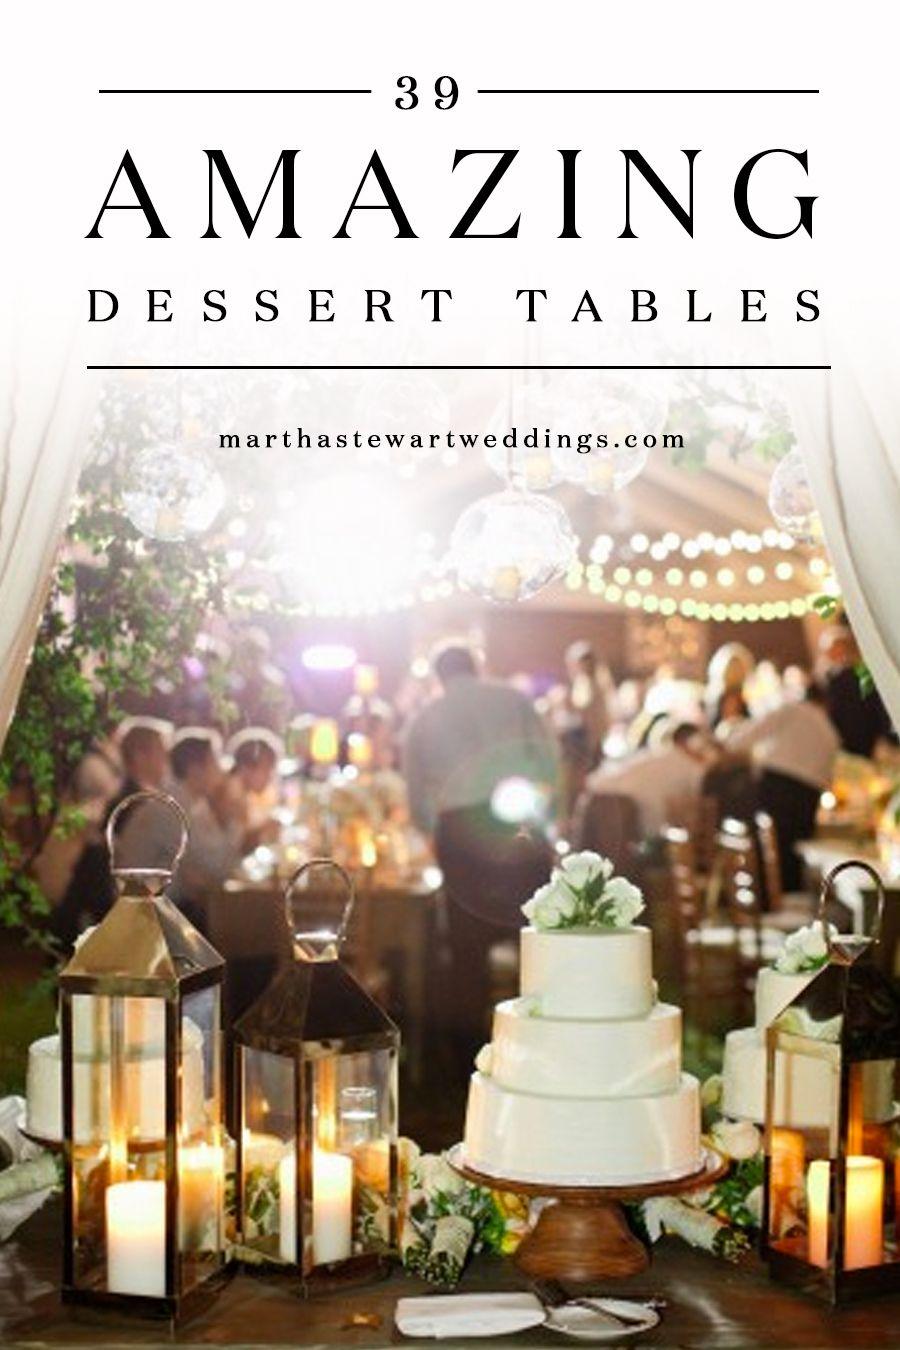 39 Amazing Dessert Tables